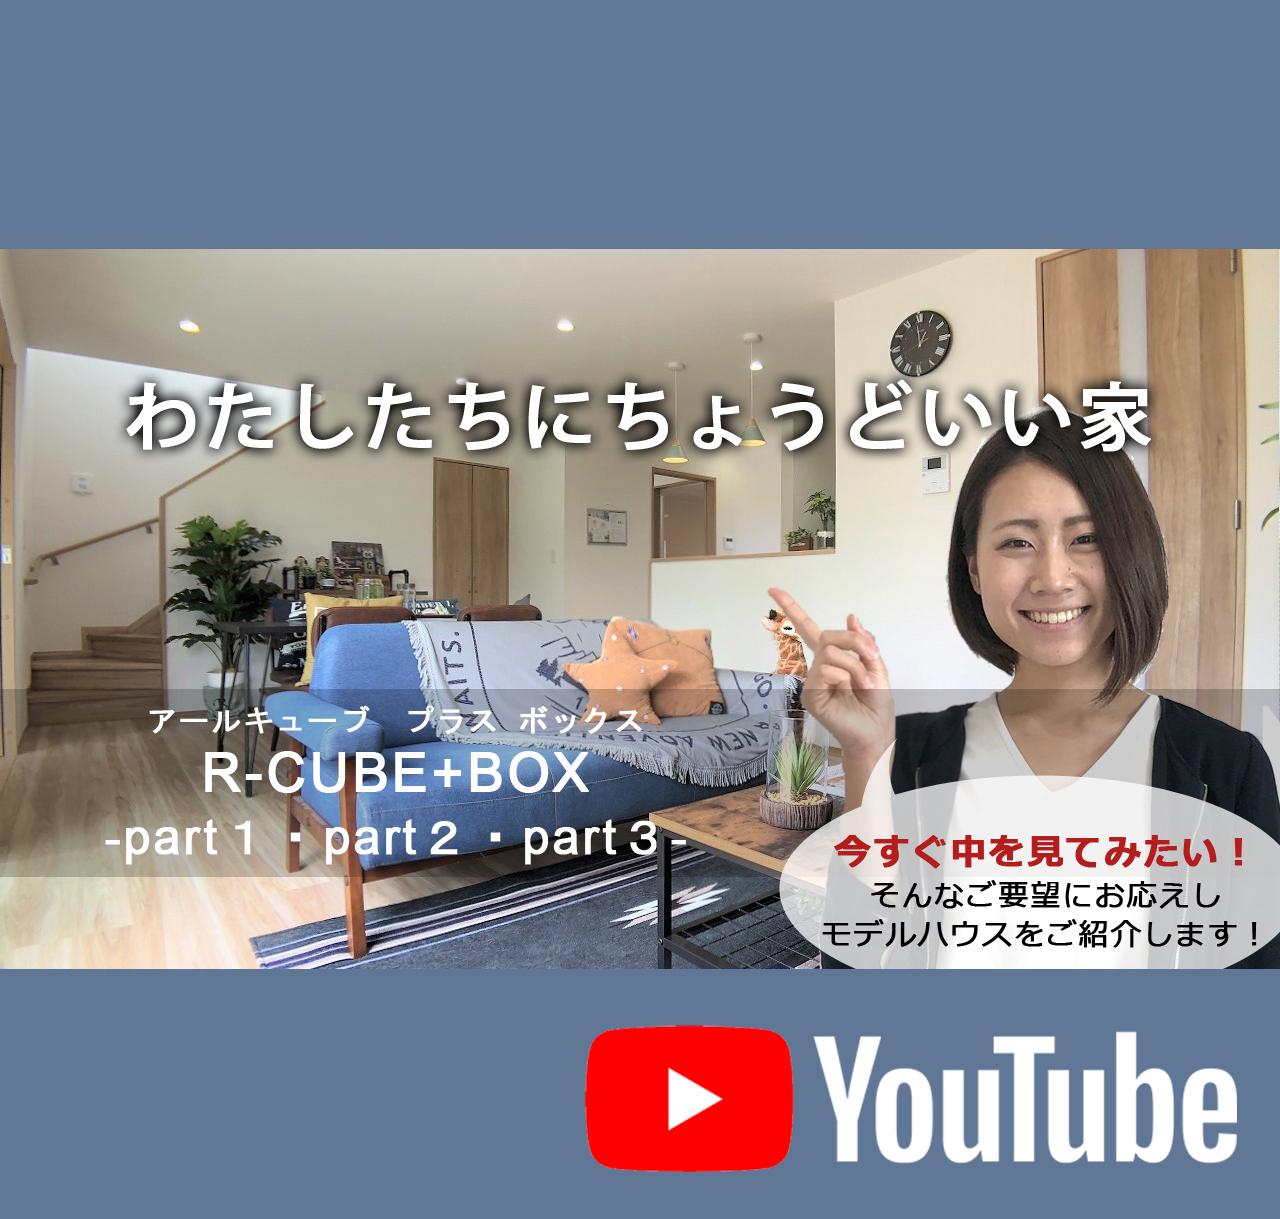 Youtube限定!WEB見学会 R-CUBE+BOX<!--高平3-->